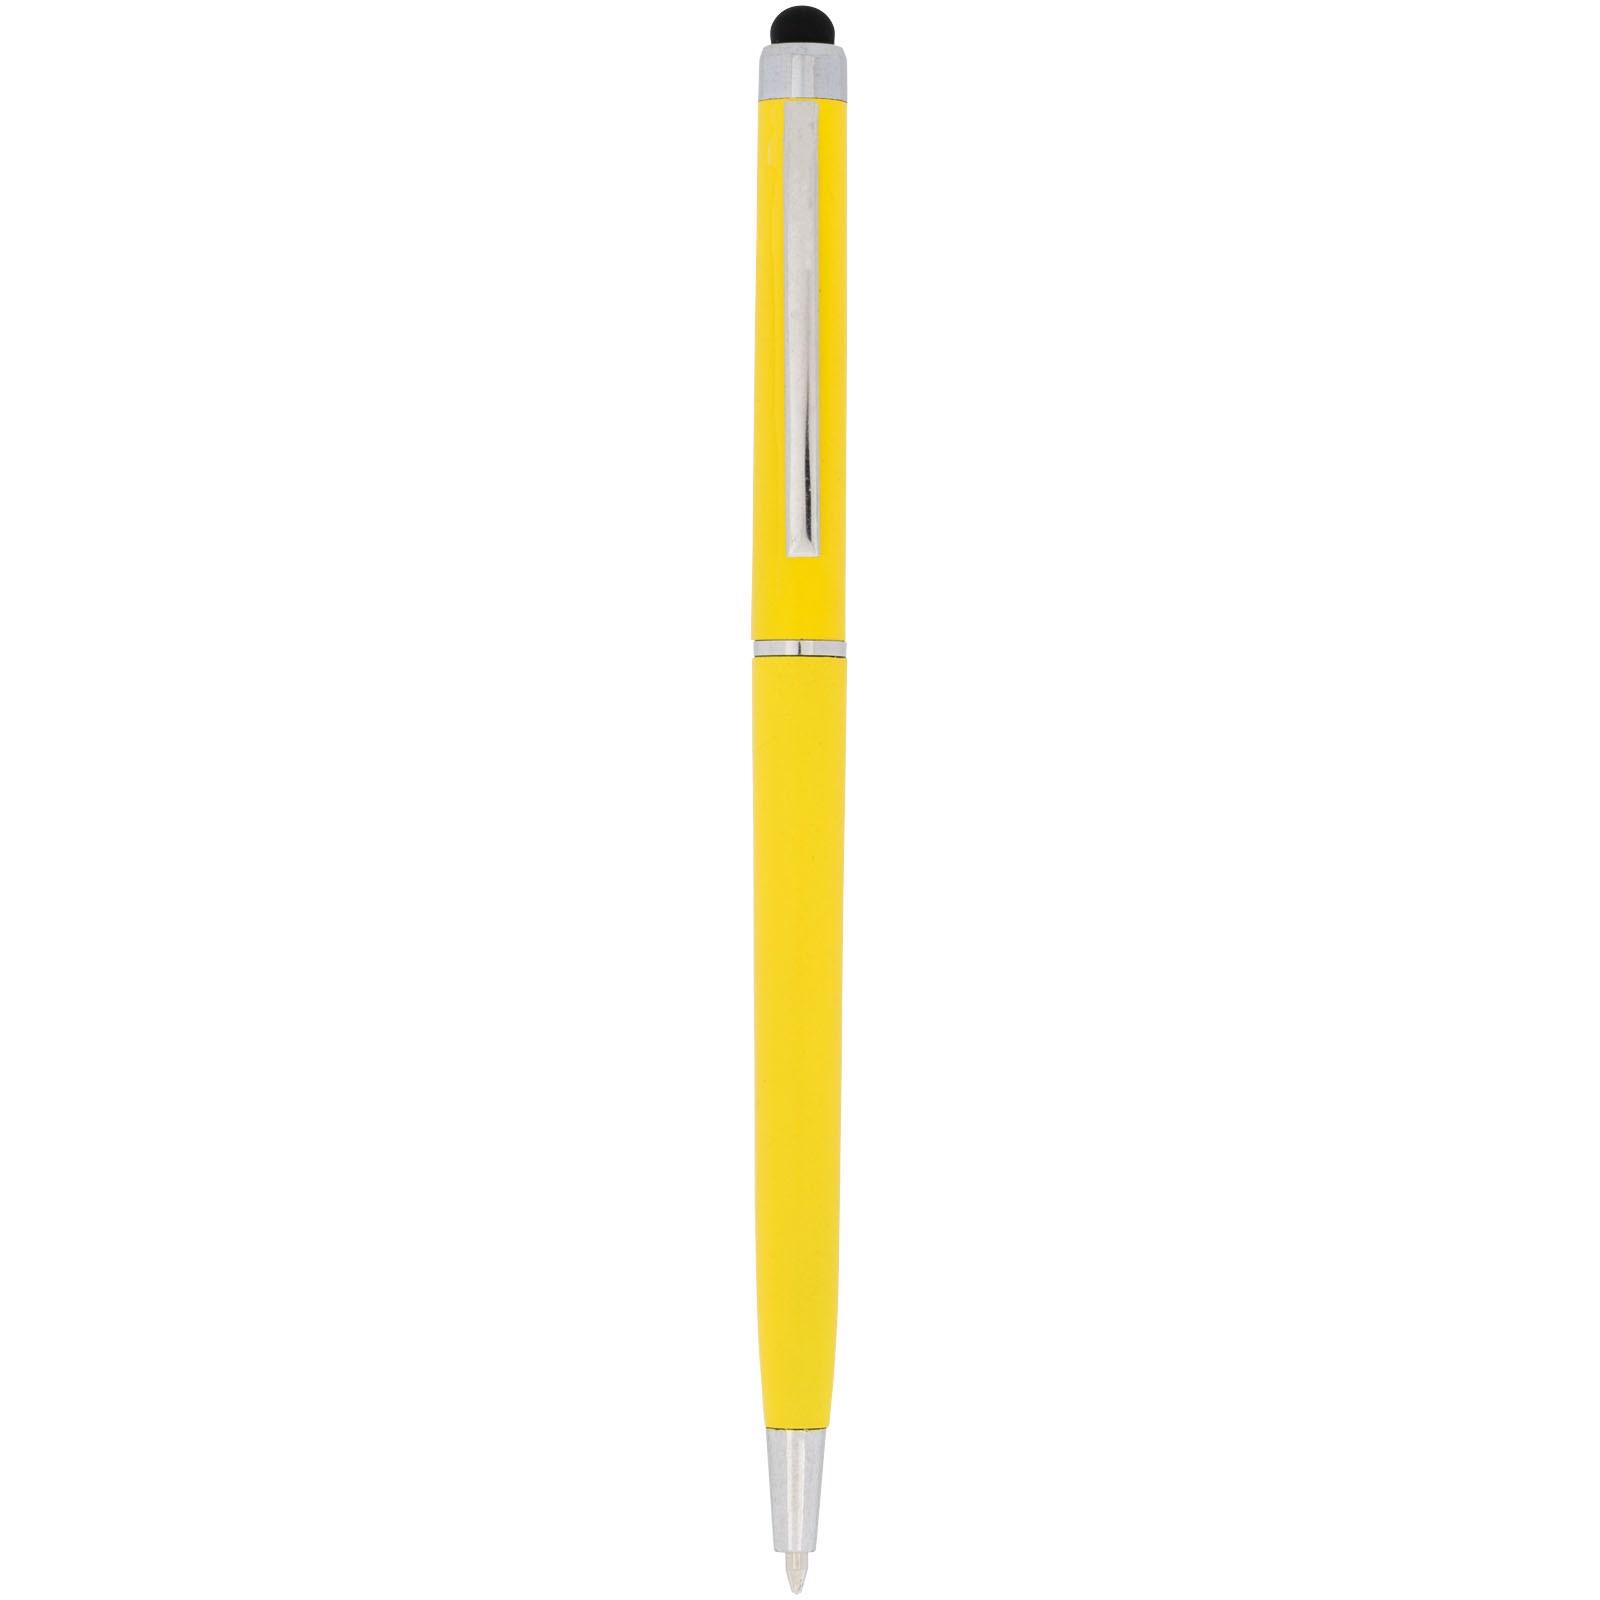 Kuličkové pero a stylus Valeria z ABS plastu - Žlutá